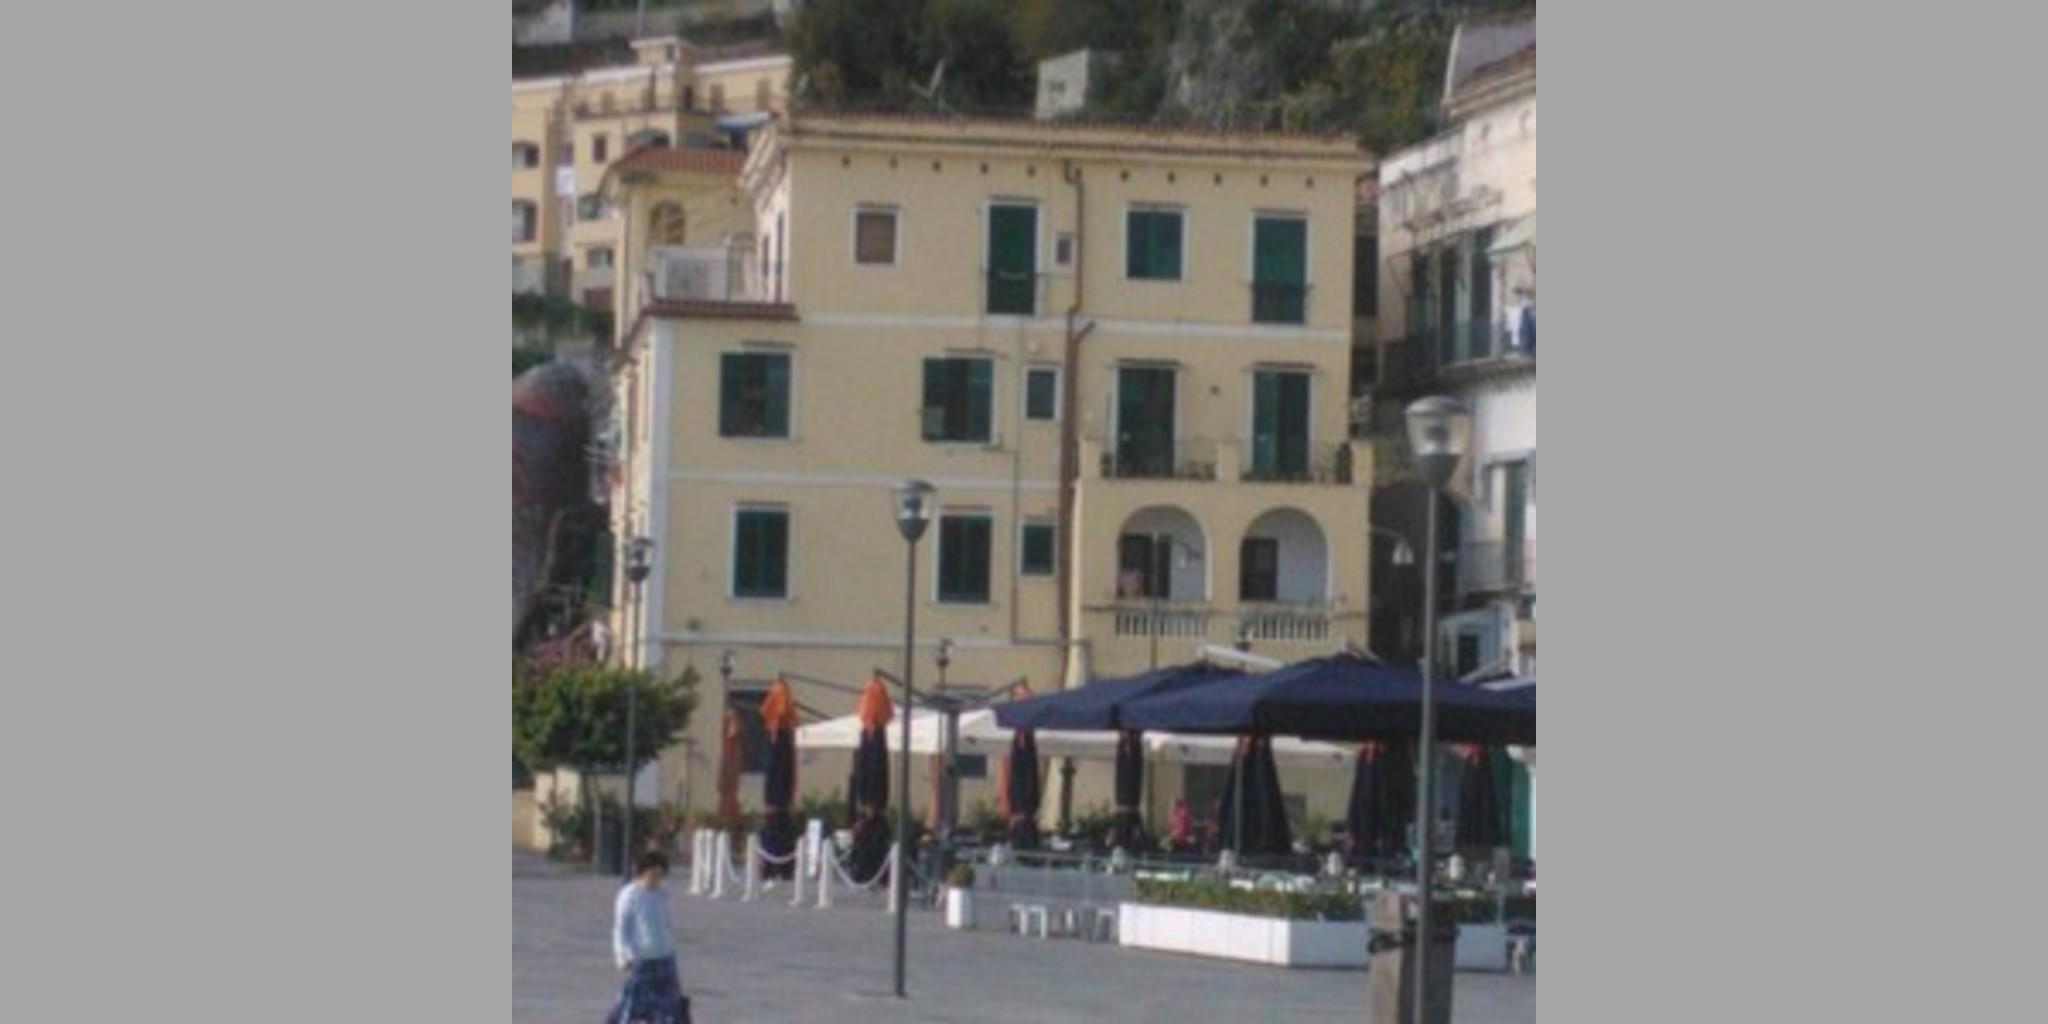 Apartment Vietri Sul Mare - Costiera Amalfitana_Vietri